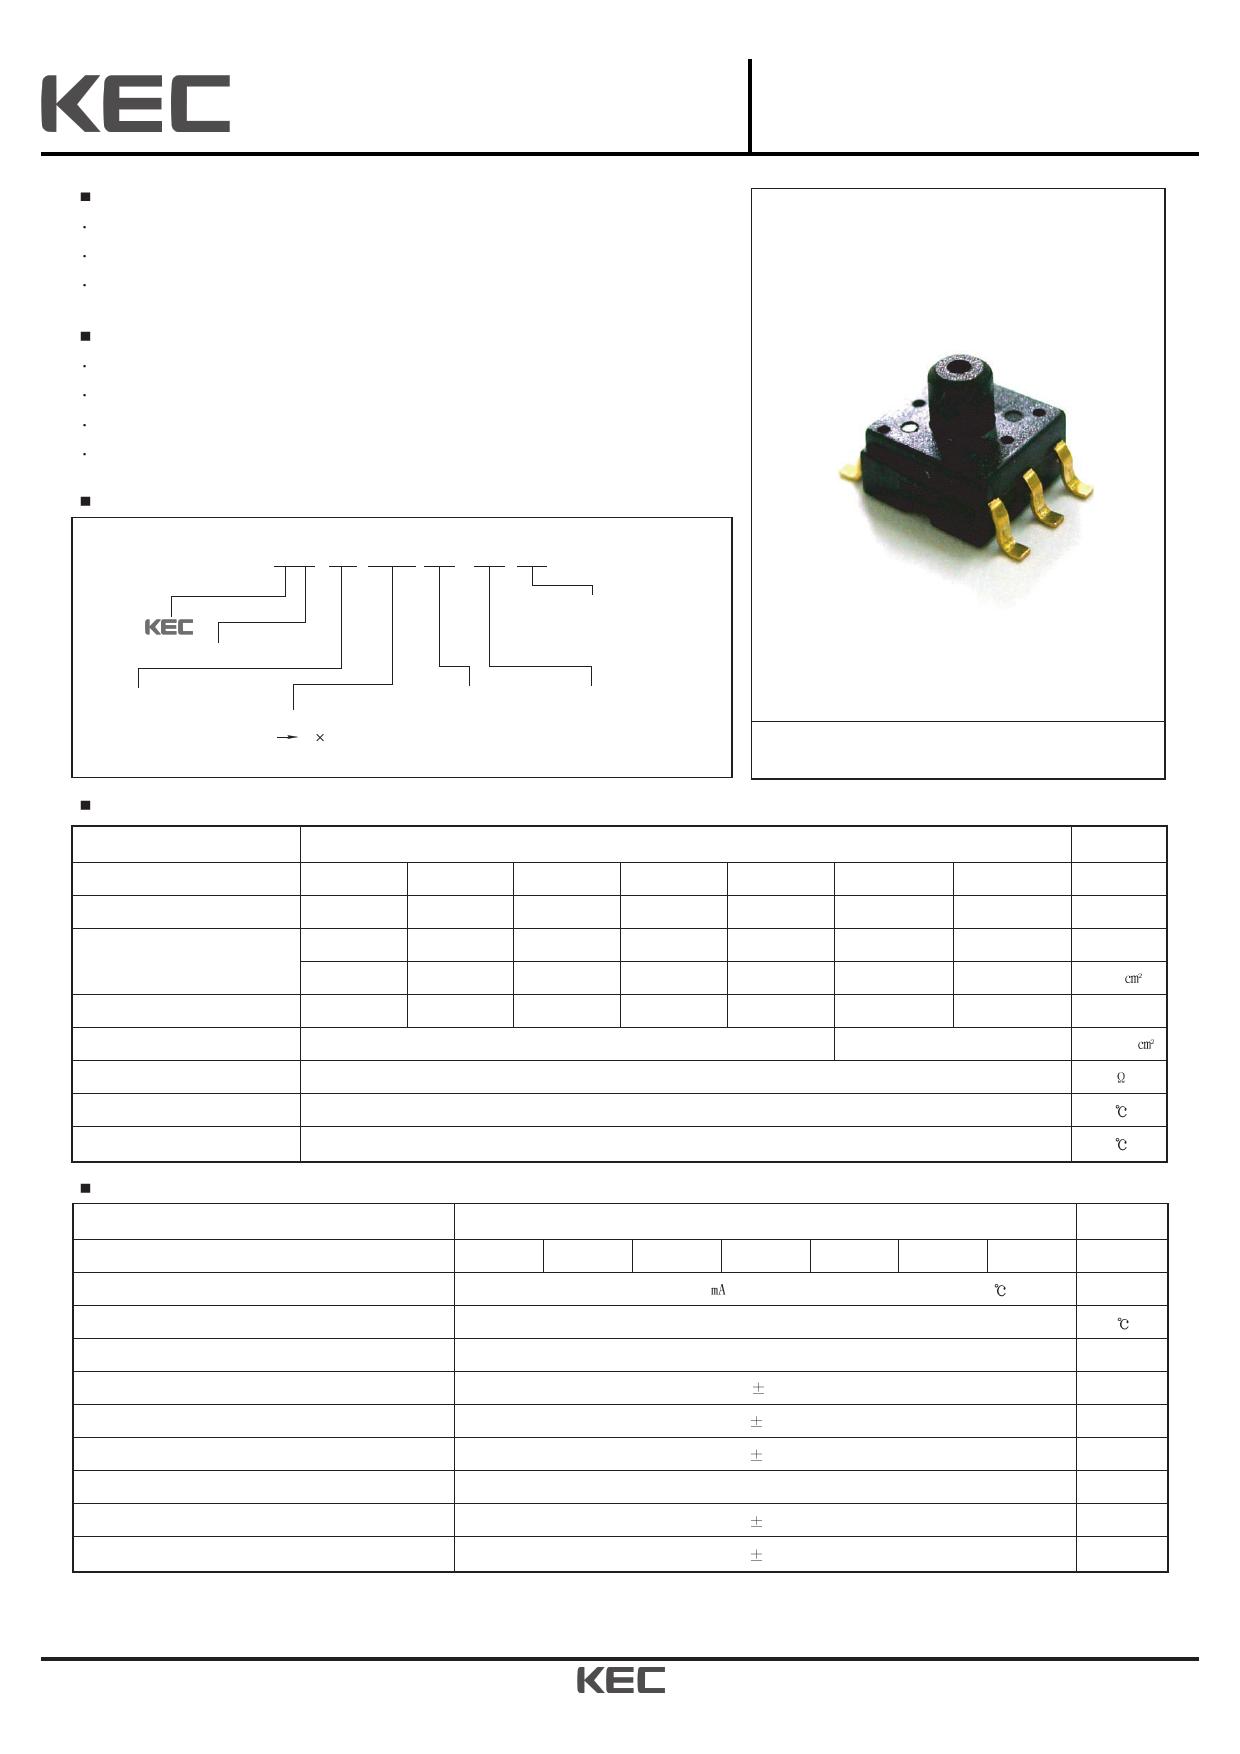 KPF500G03 데이터시트 및 KPF500G03 PDF